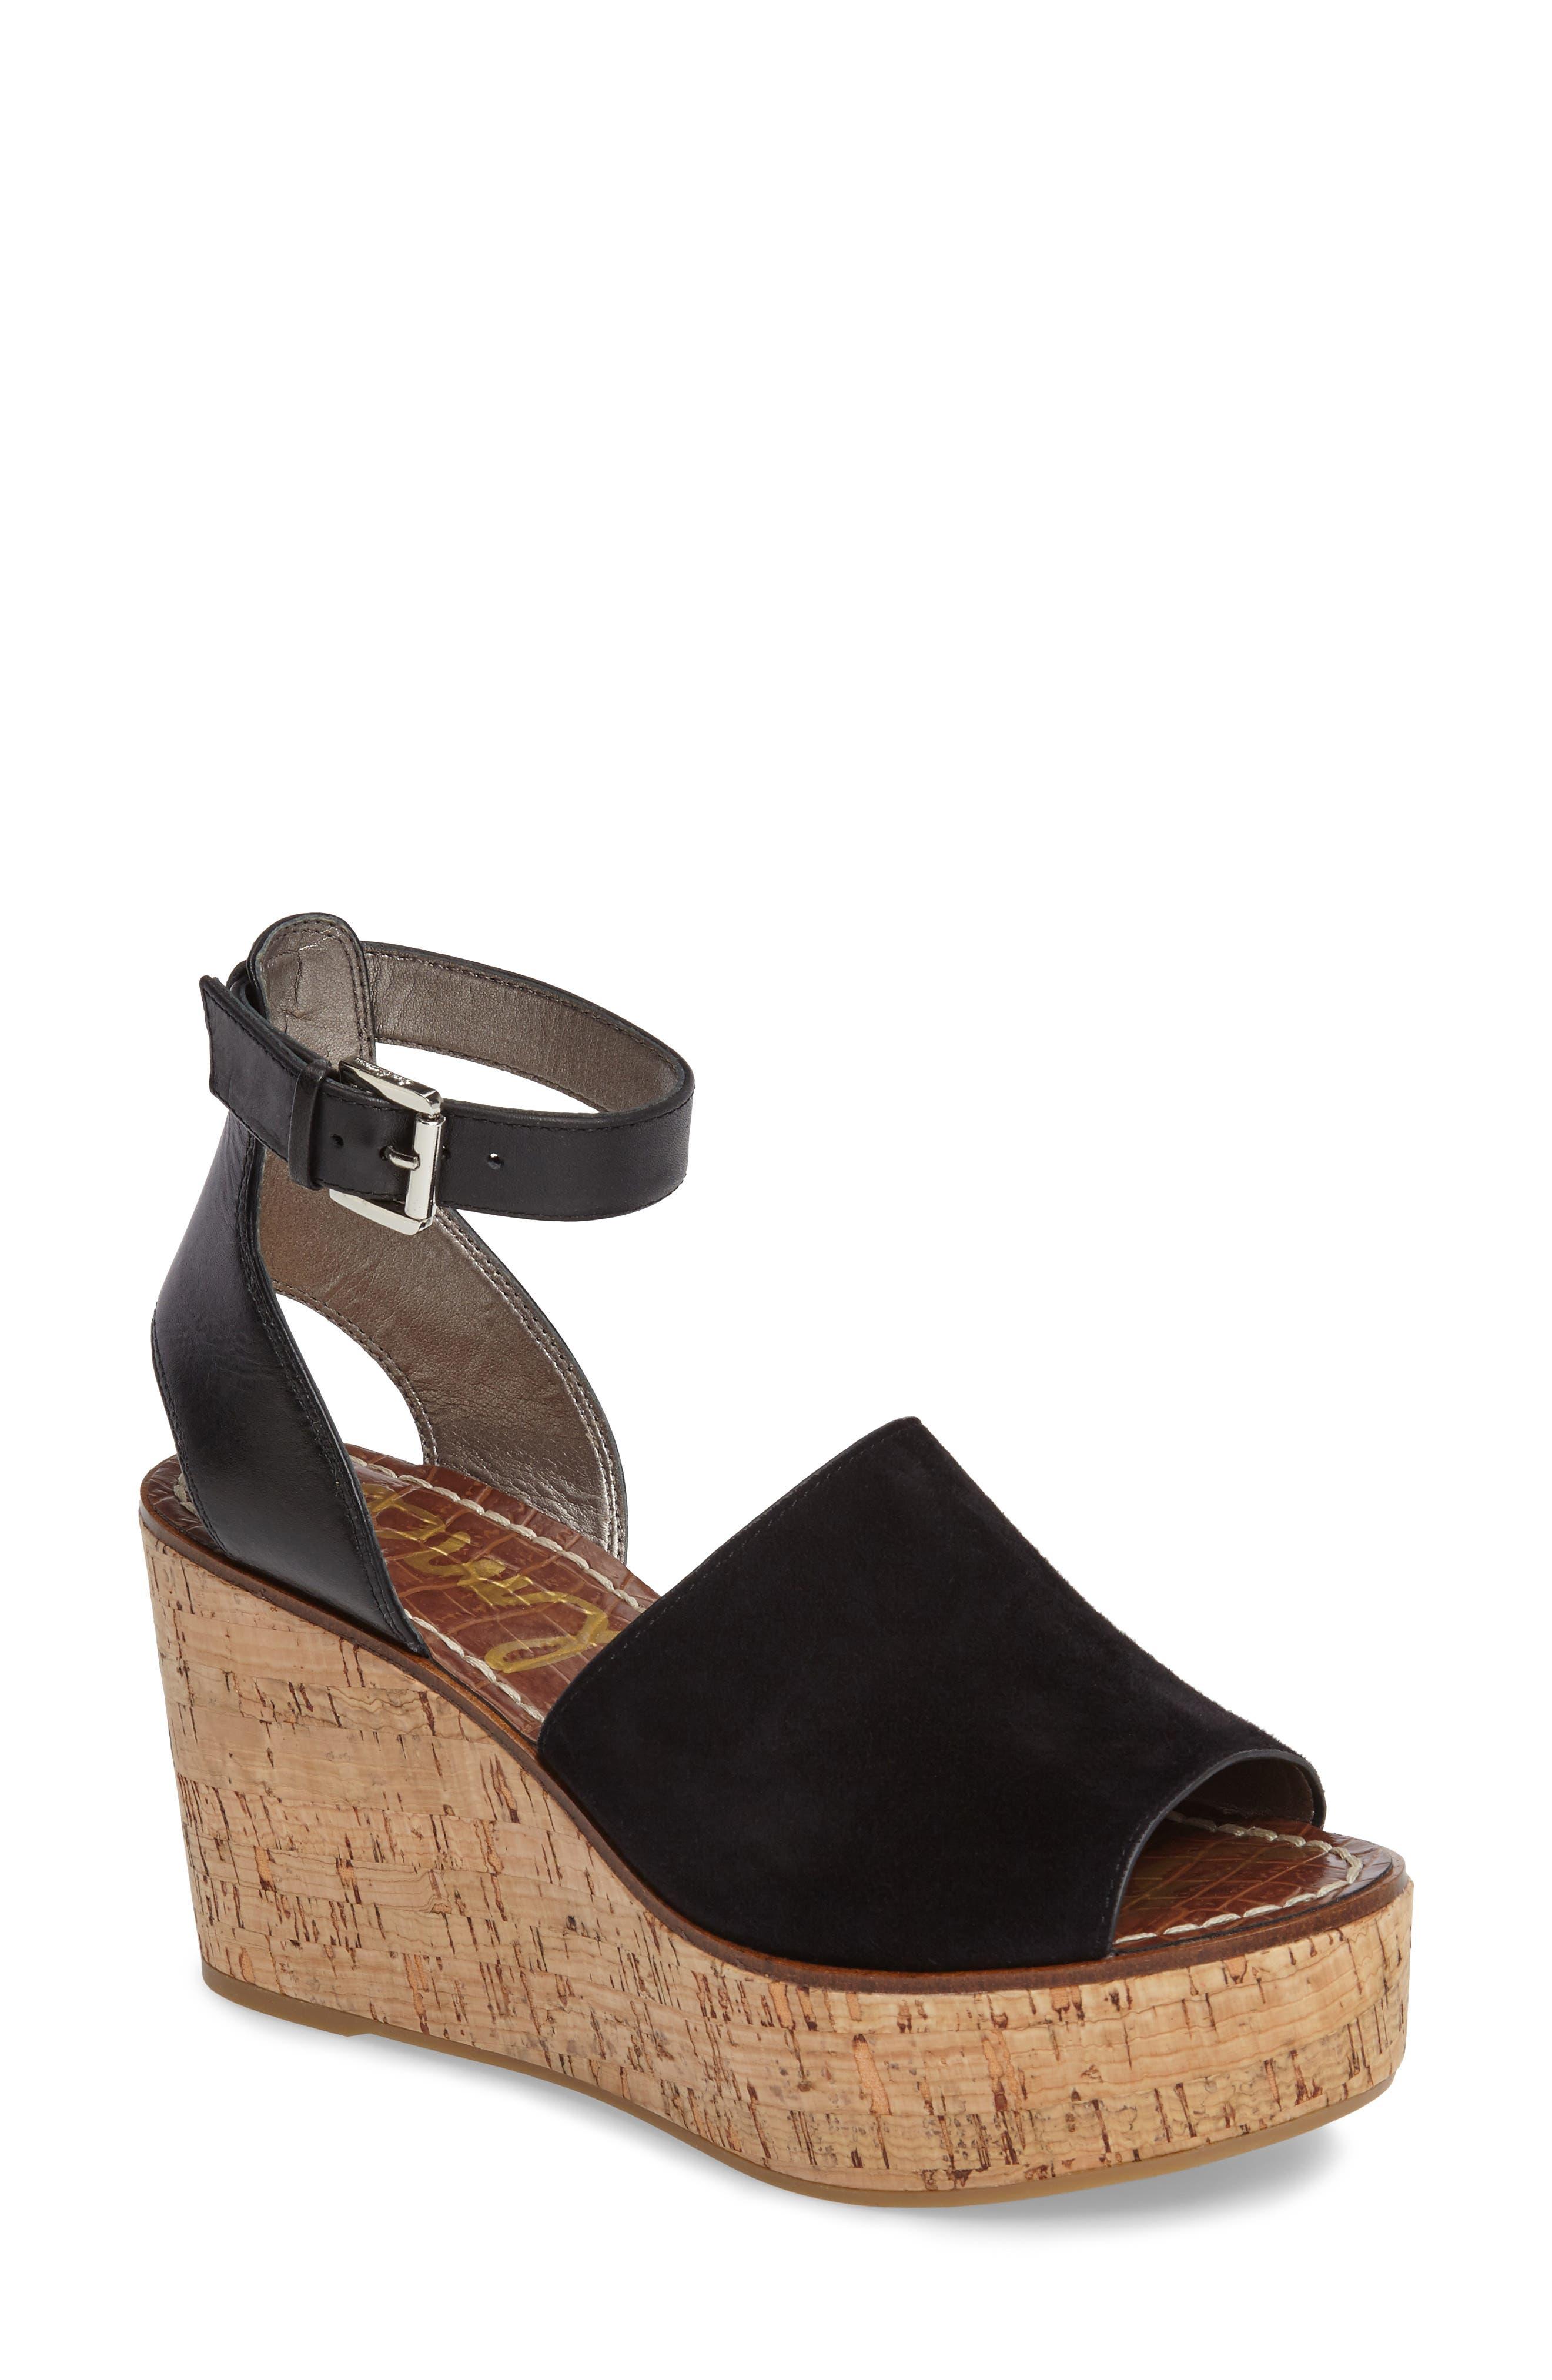 Main Image - Sam Edelman Devin Platform Wedge Sandal (Women)